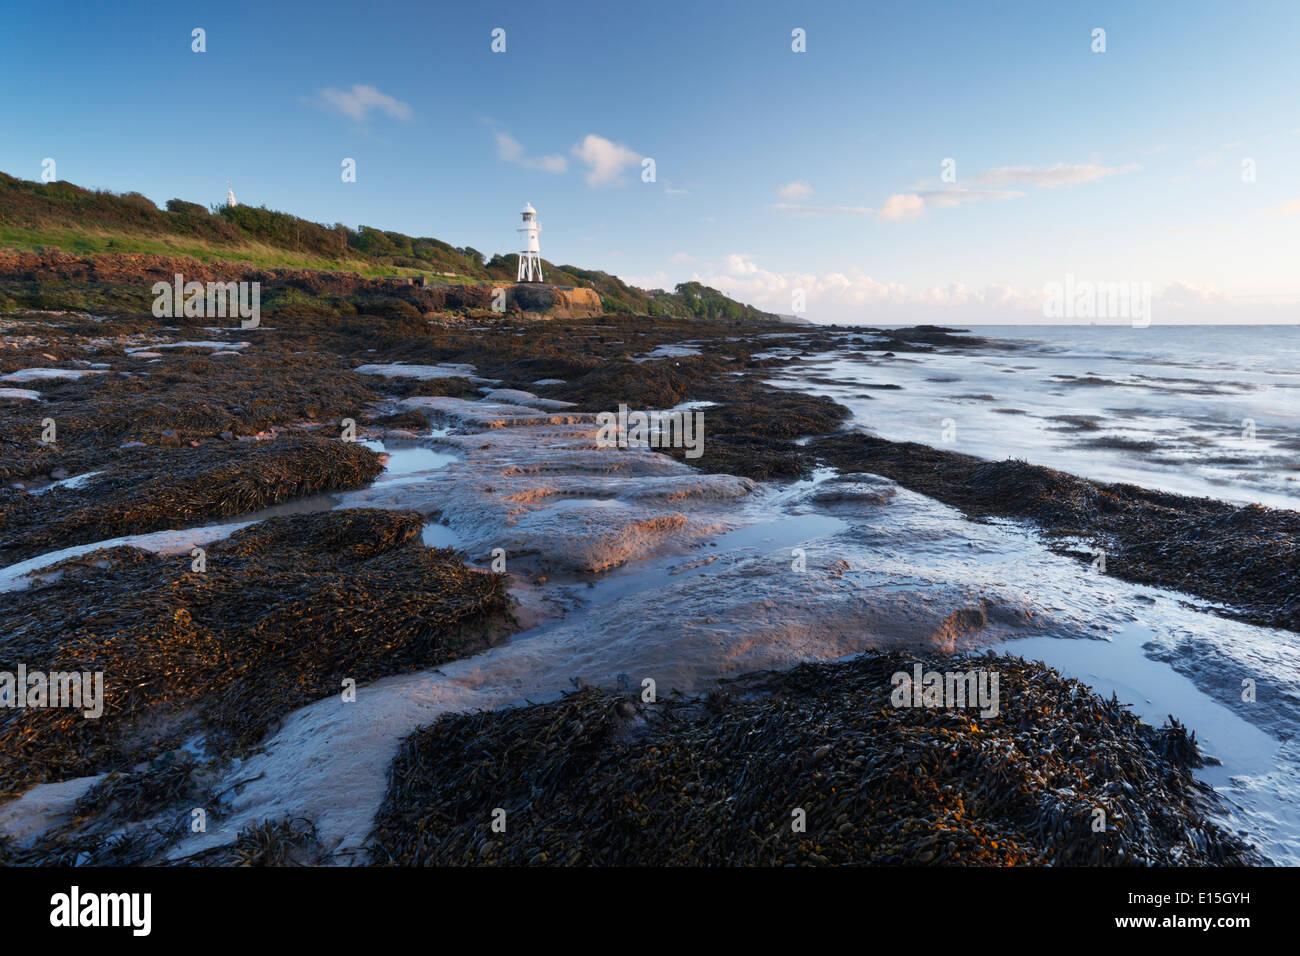 Black Nore Lighthouse. Portishead. North Somerset. England. UK. - Stock Image